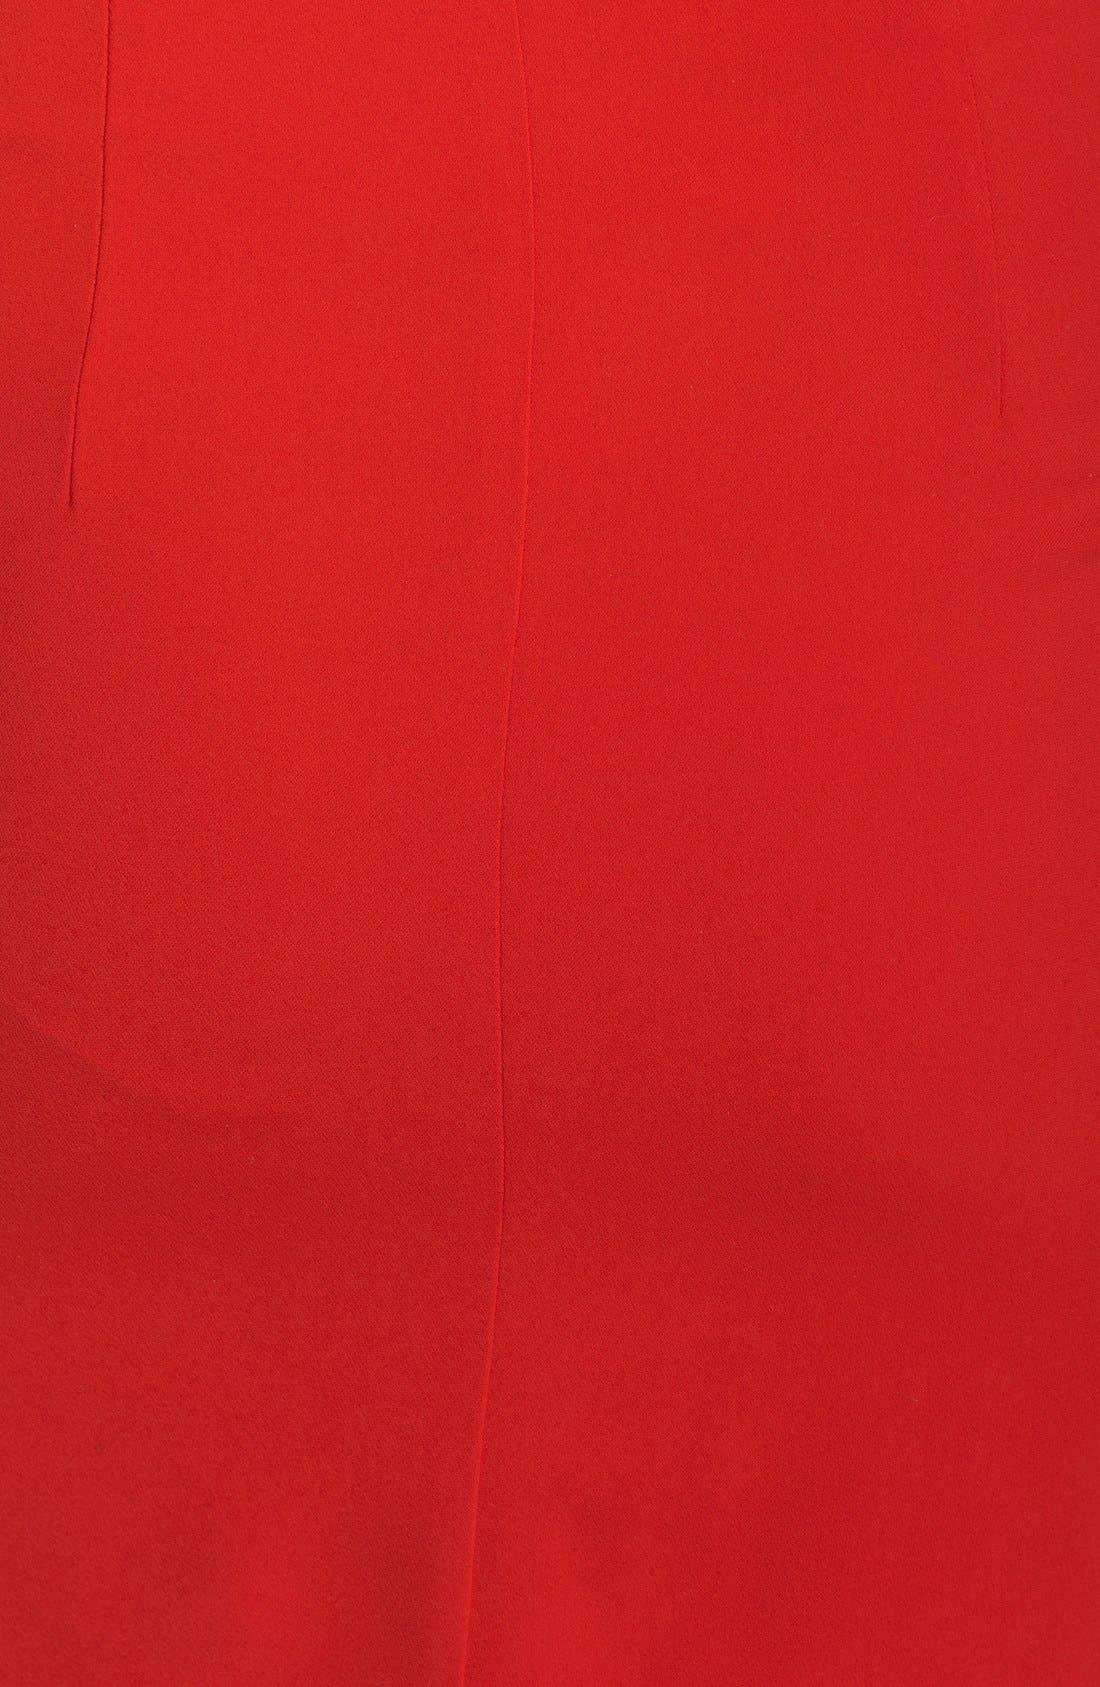 Alternate Image 4  - Clove Back Cutout Pleated Blouson Dress (Nordstrom Exclusive)